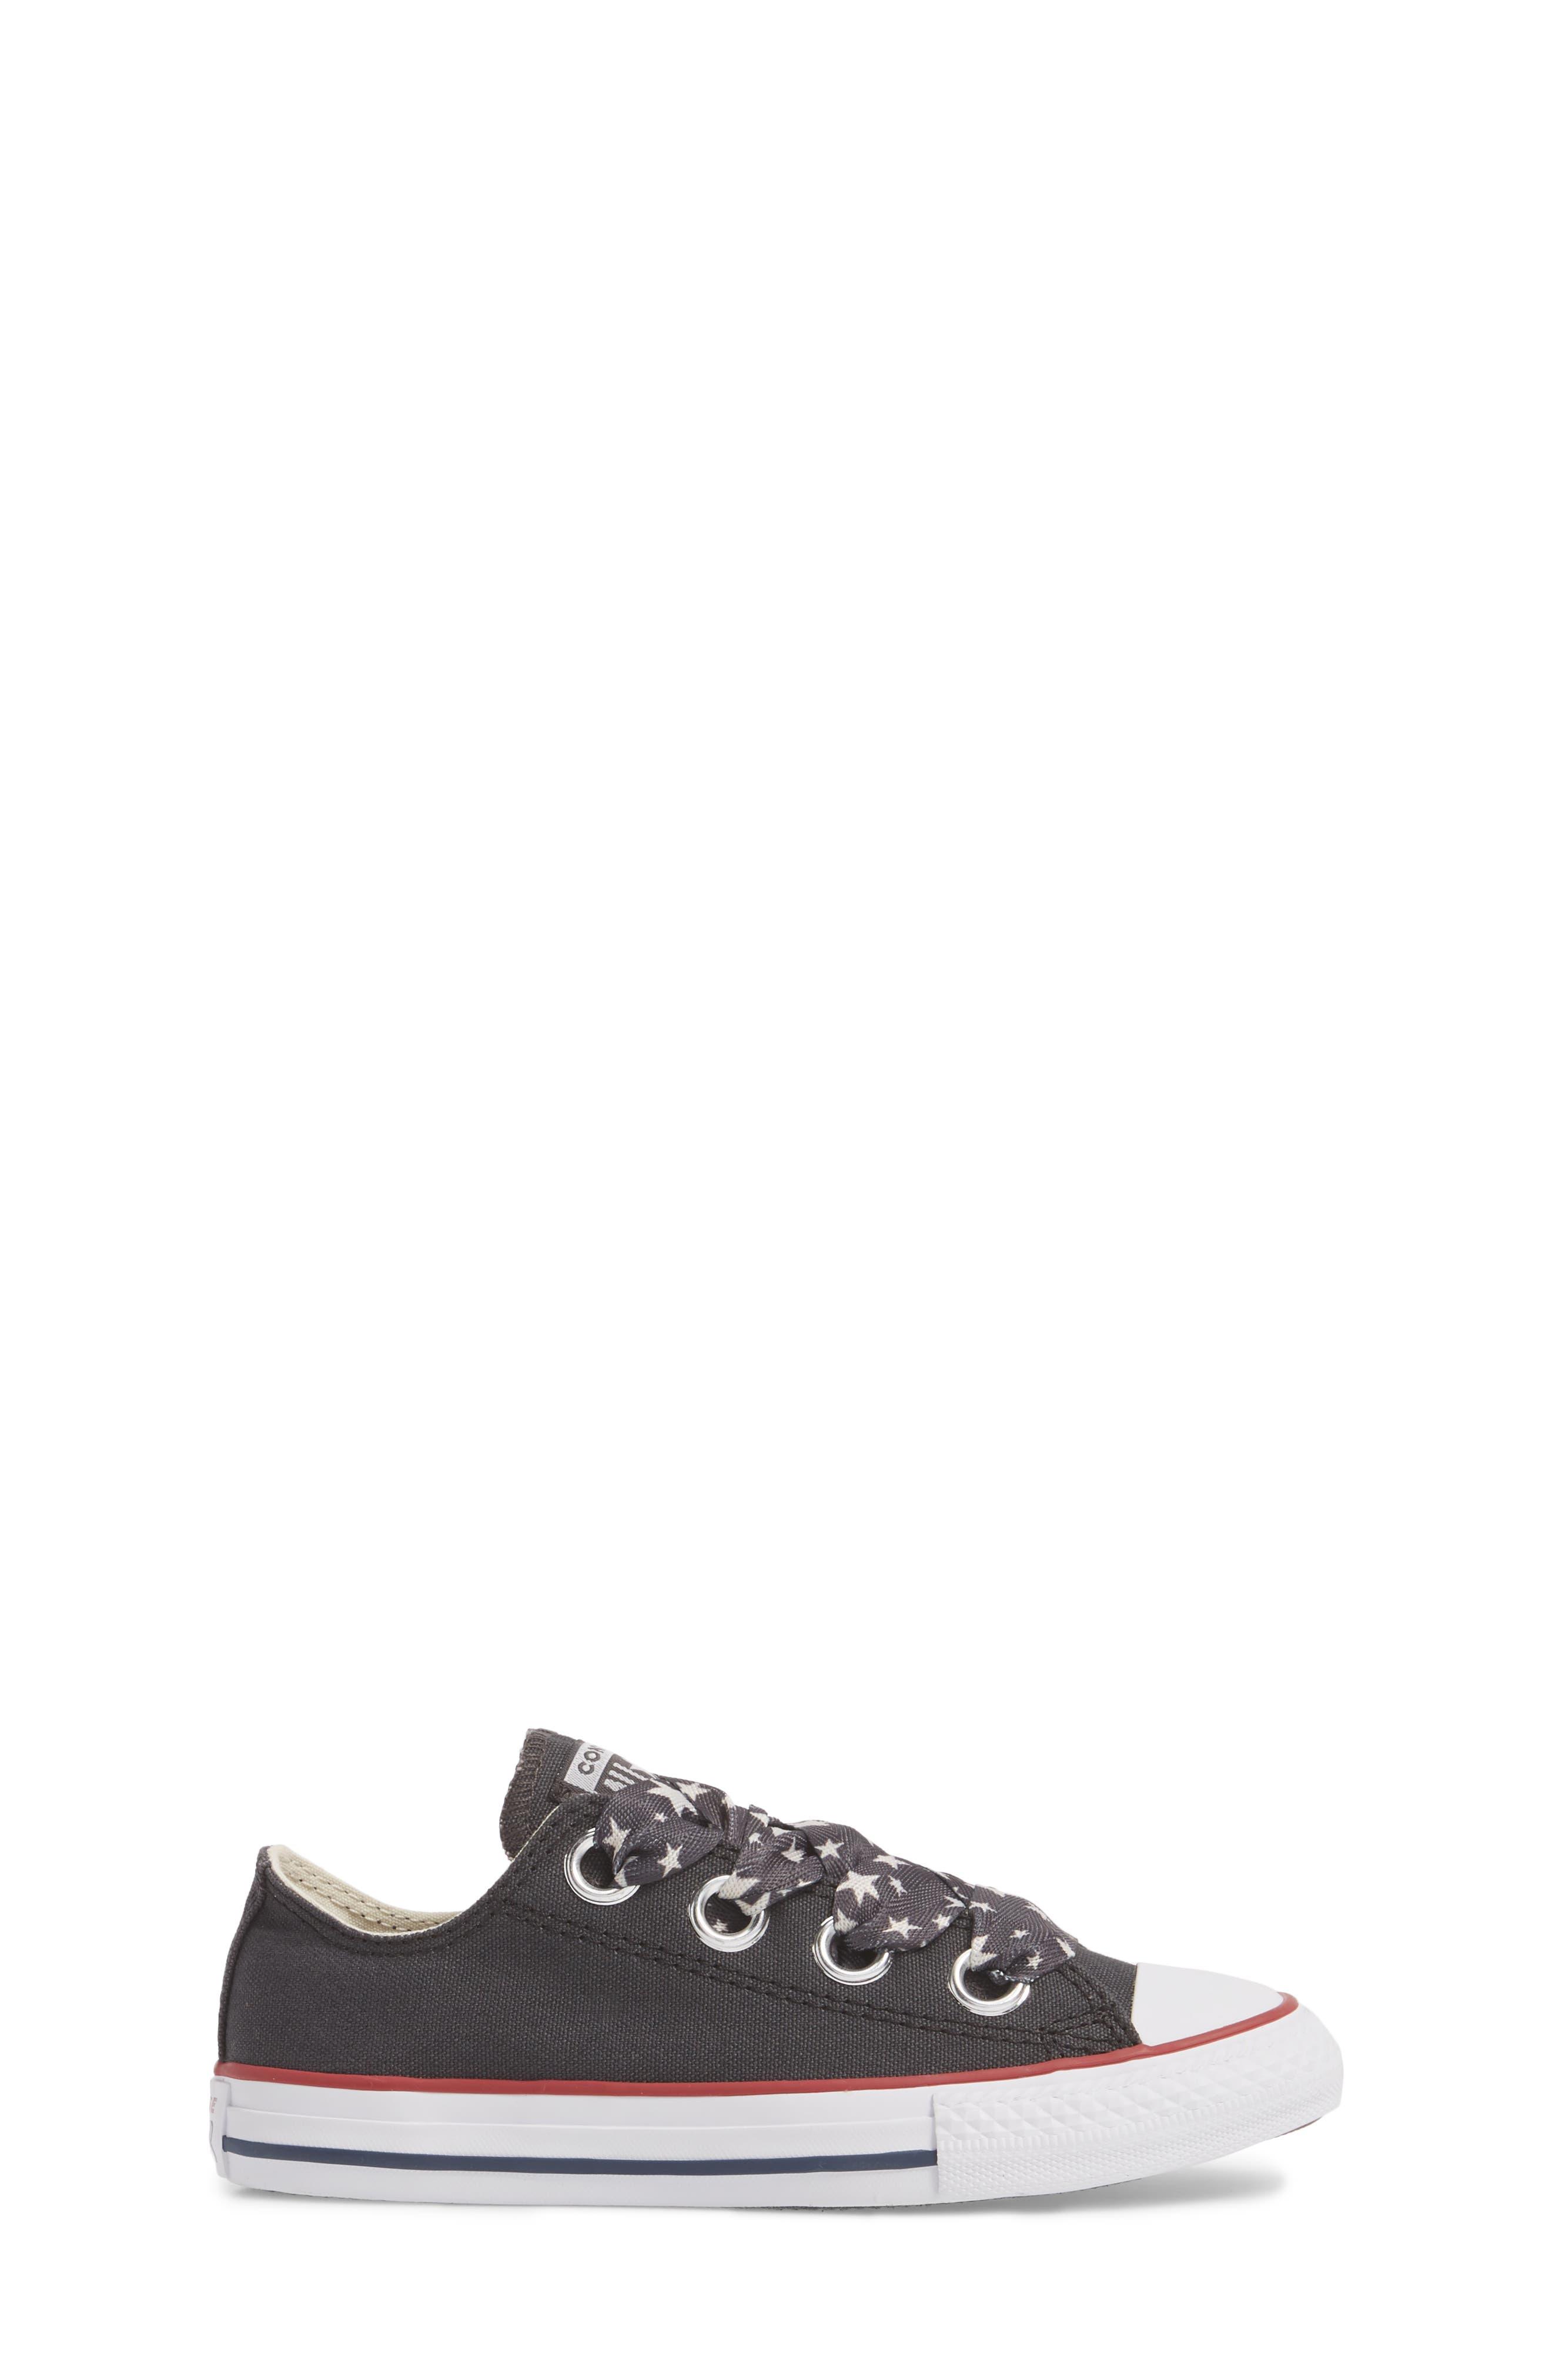 Big Eyelet Lace-Up Sneaker,                             Alternate thumbnail 3, color,                             Black